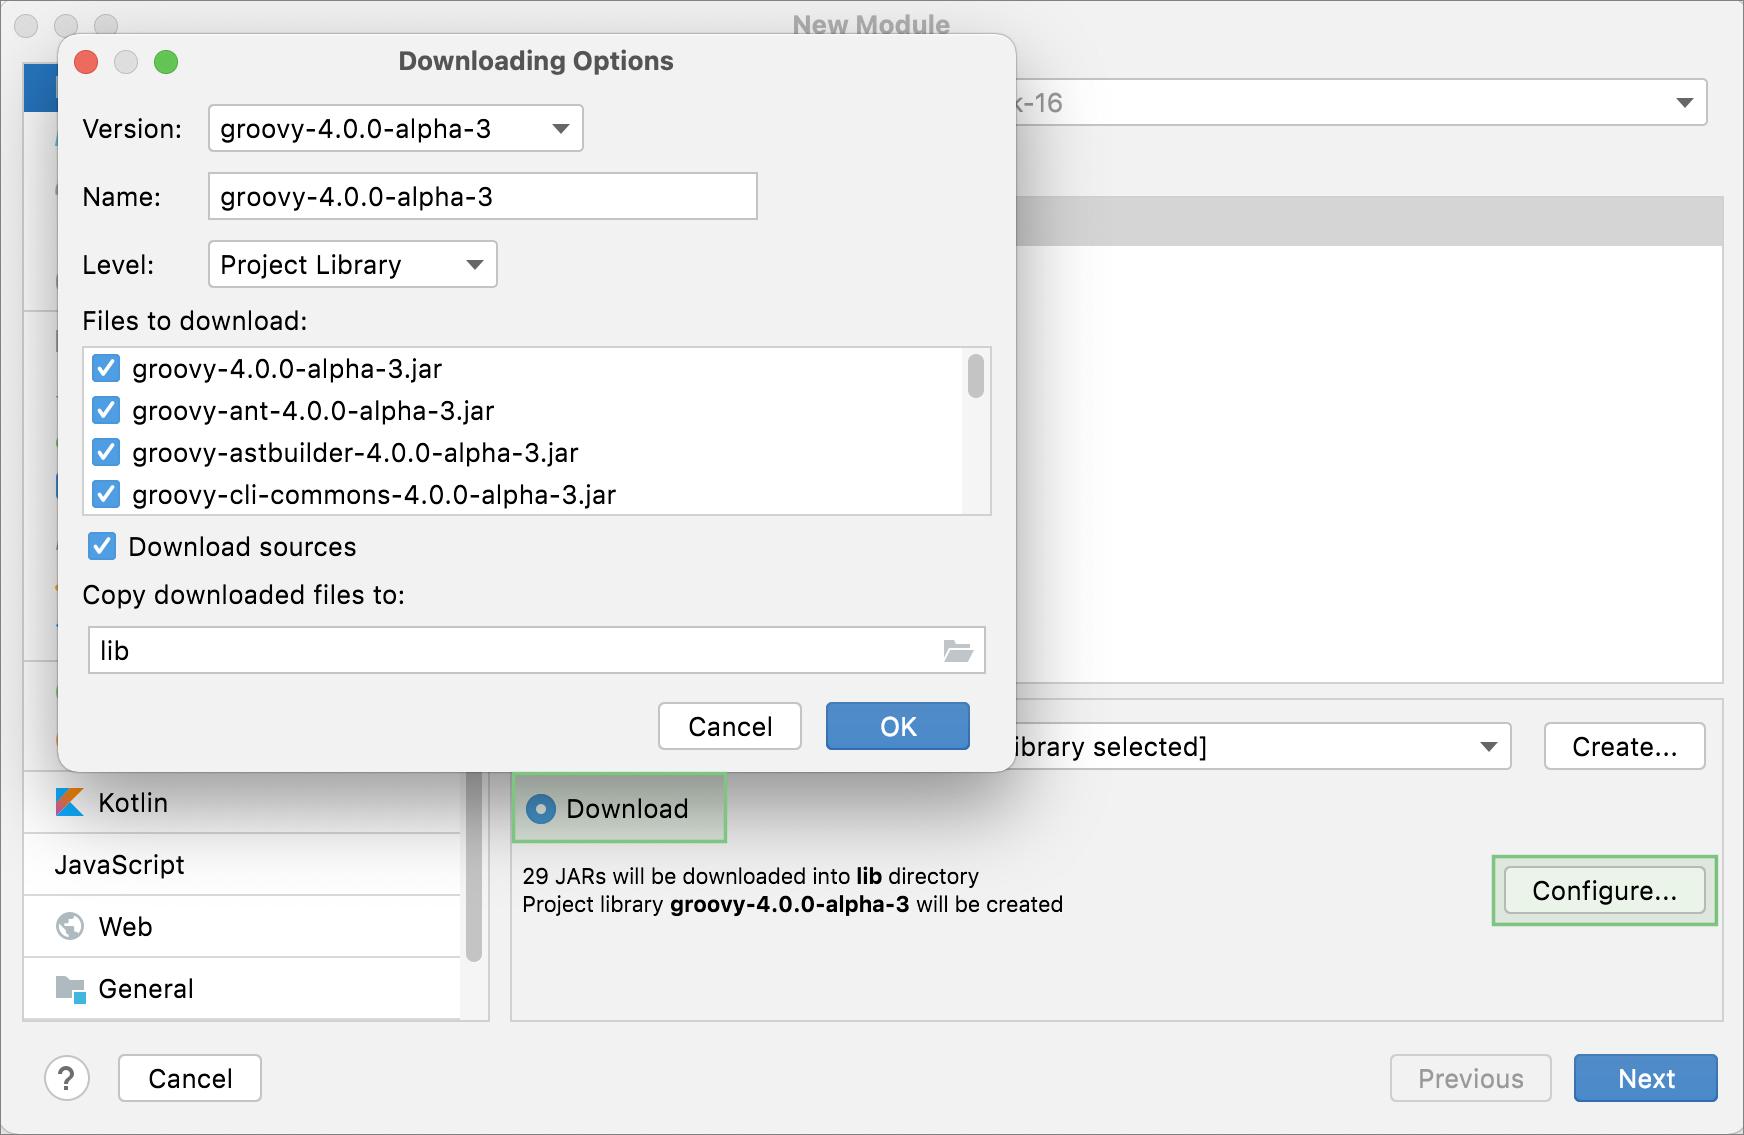 Downloading Options dialog